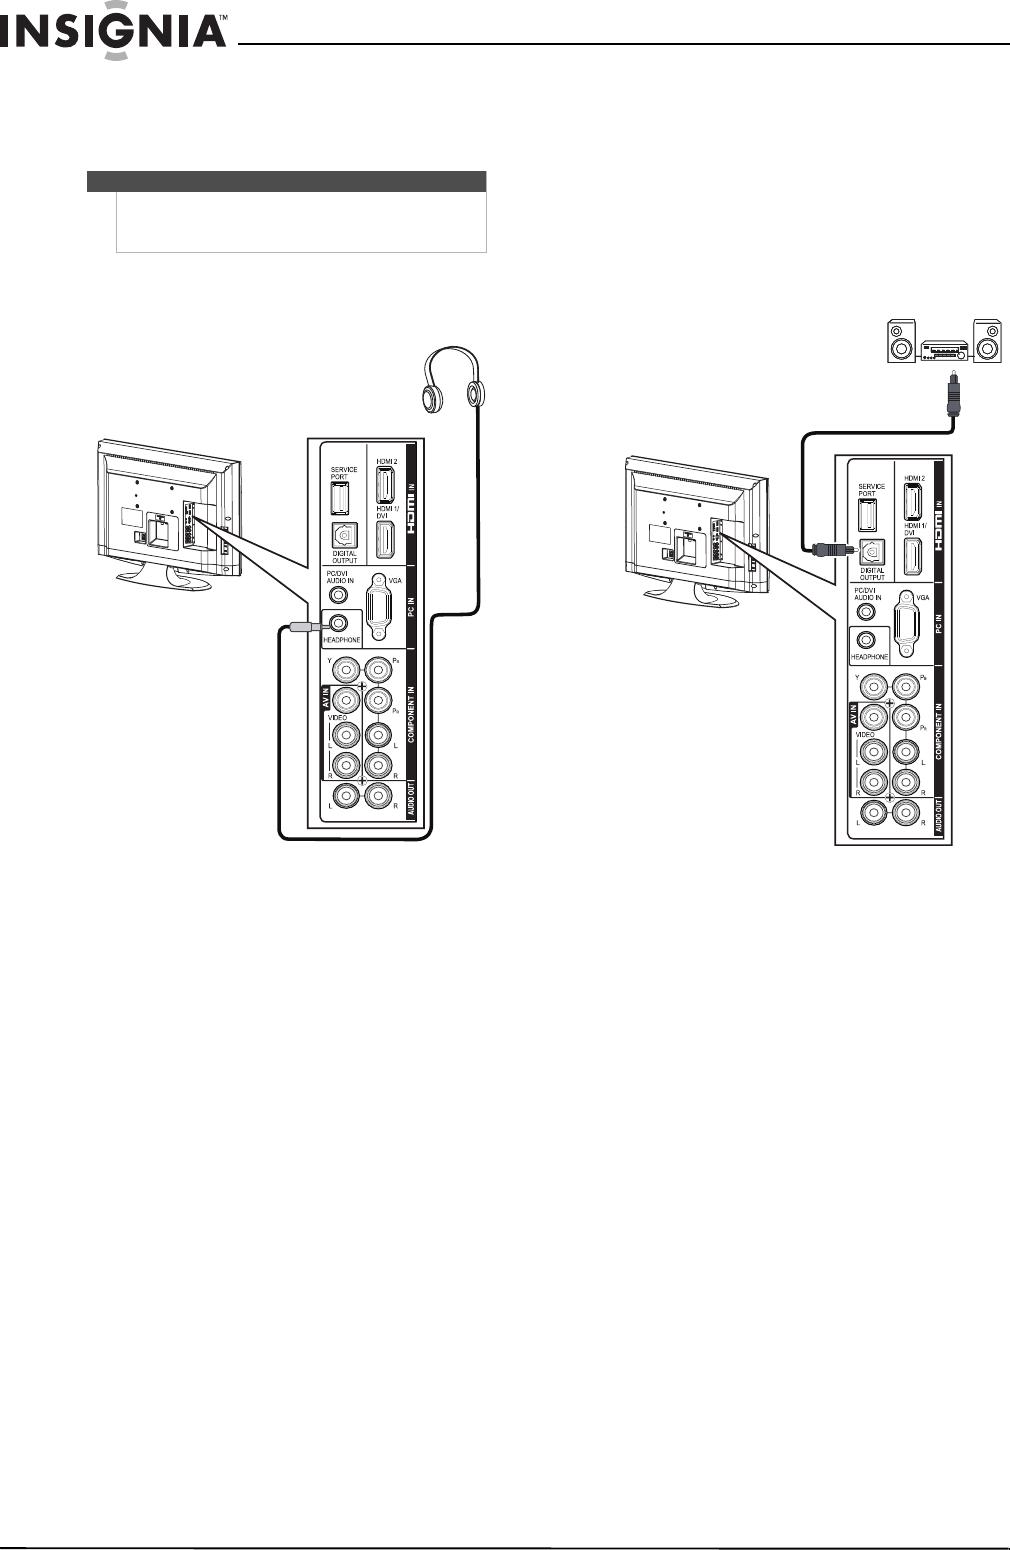 Insignia Ns 32l430a11 User Manual To The 06bf8e02 08d9 4fa2 B74b 1966 Mustang Philco Radio Wiring Diagram 16